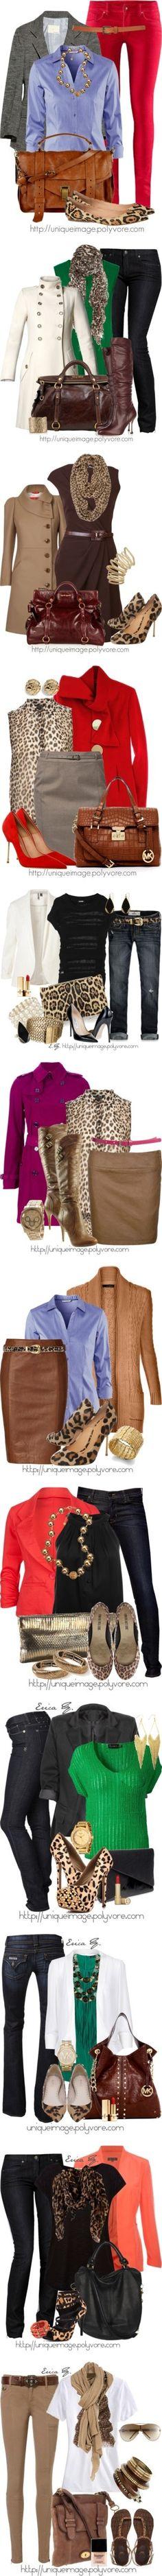 More work fashion by Genia3217